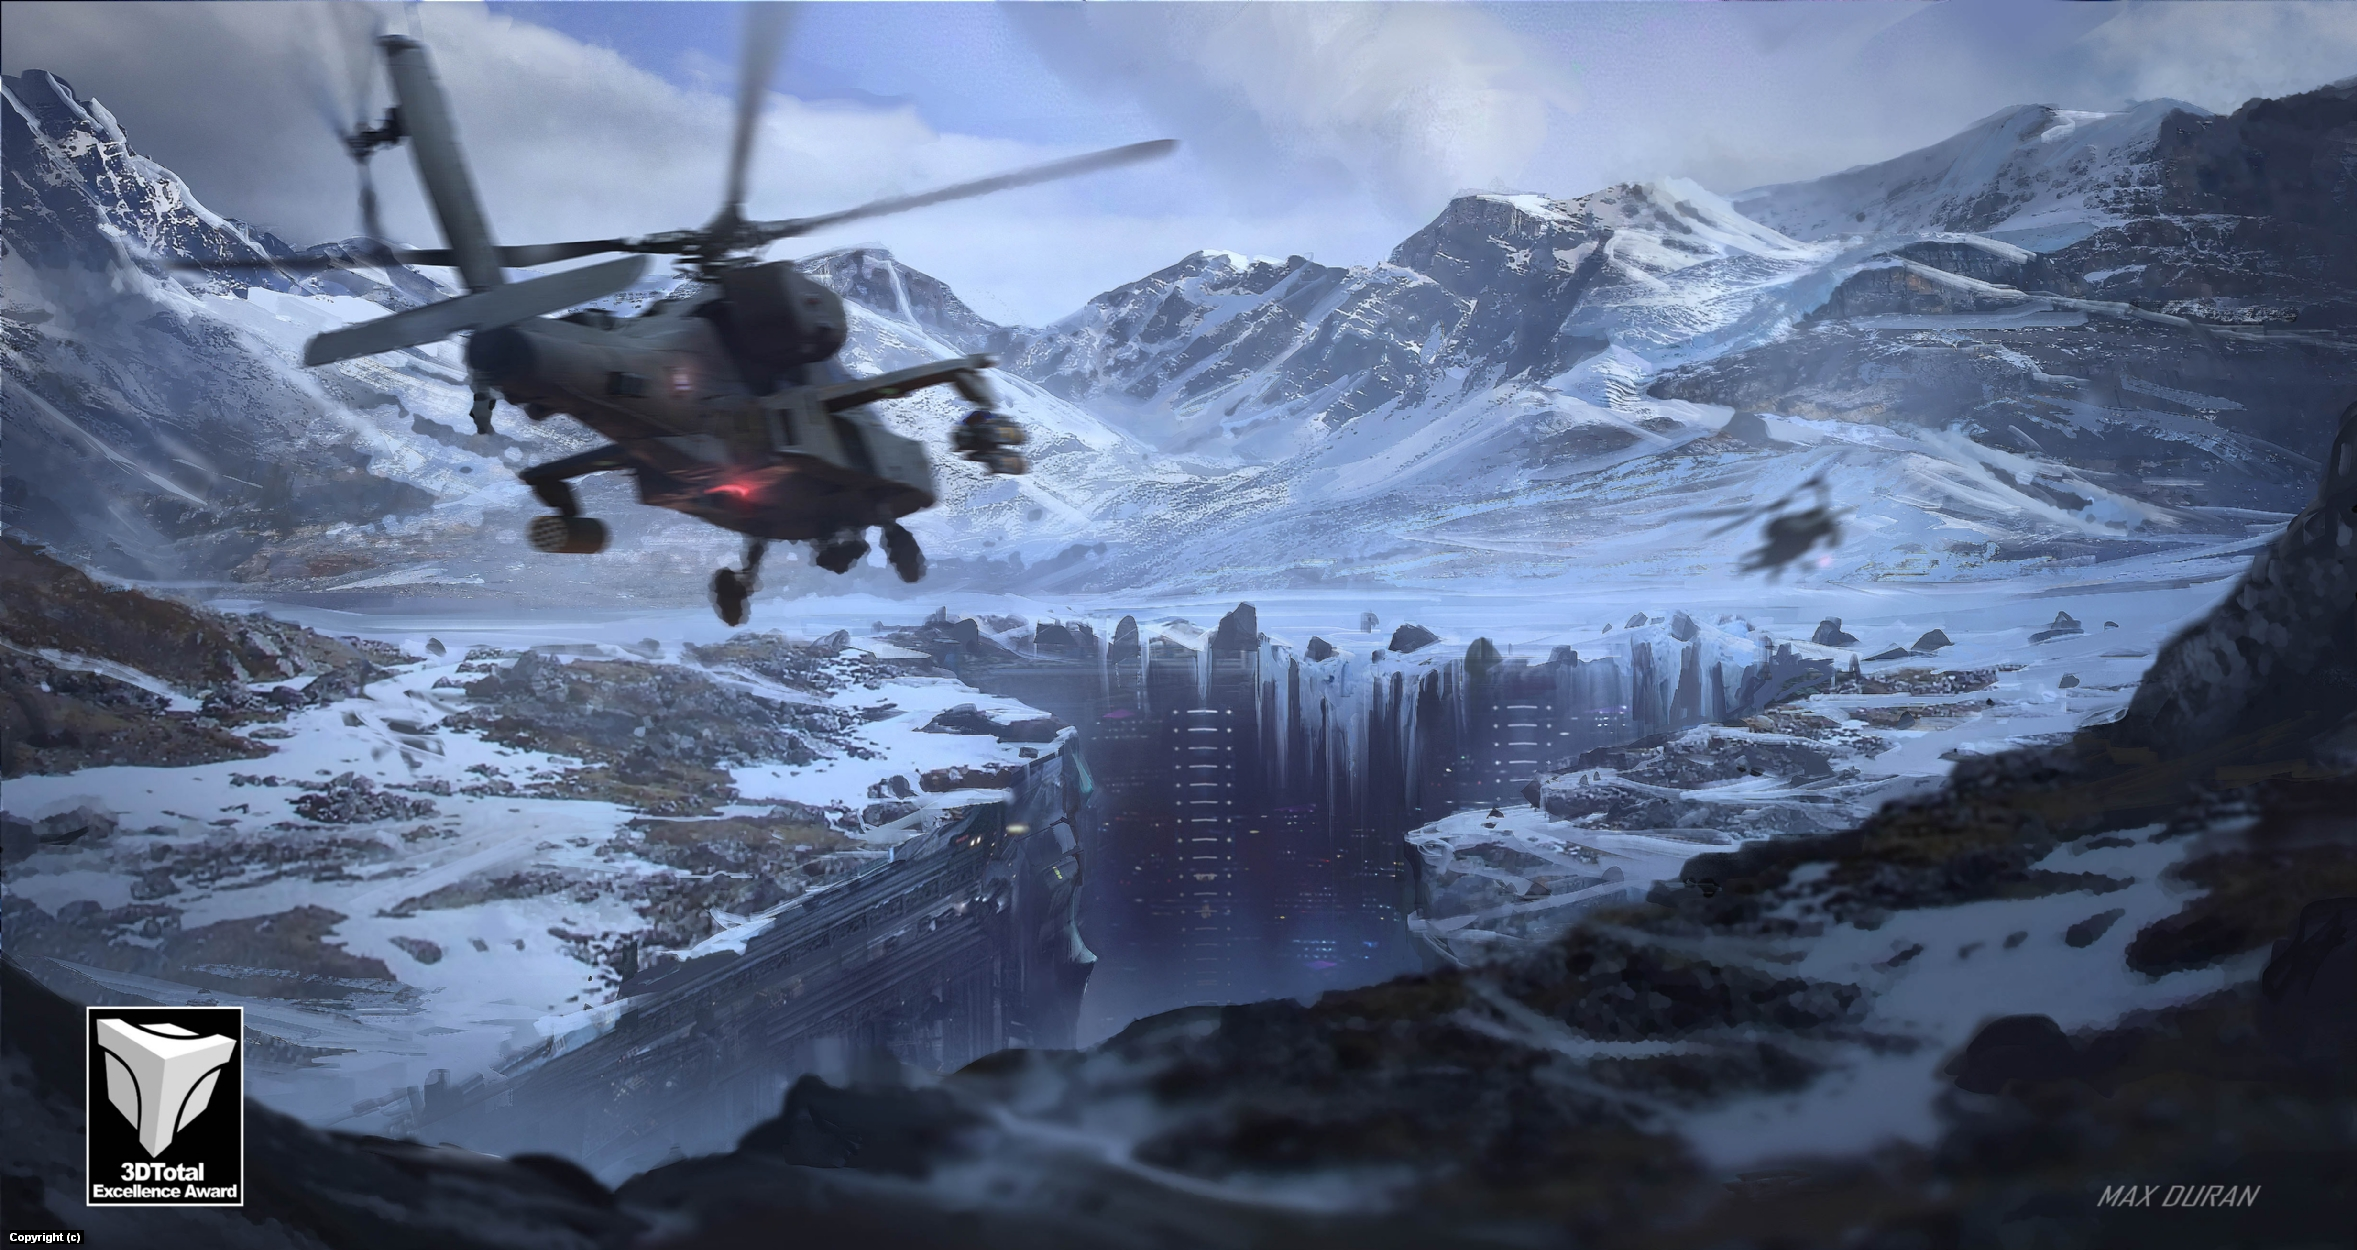 Mountains seacret Base Artwork by Max Duran